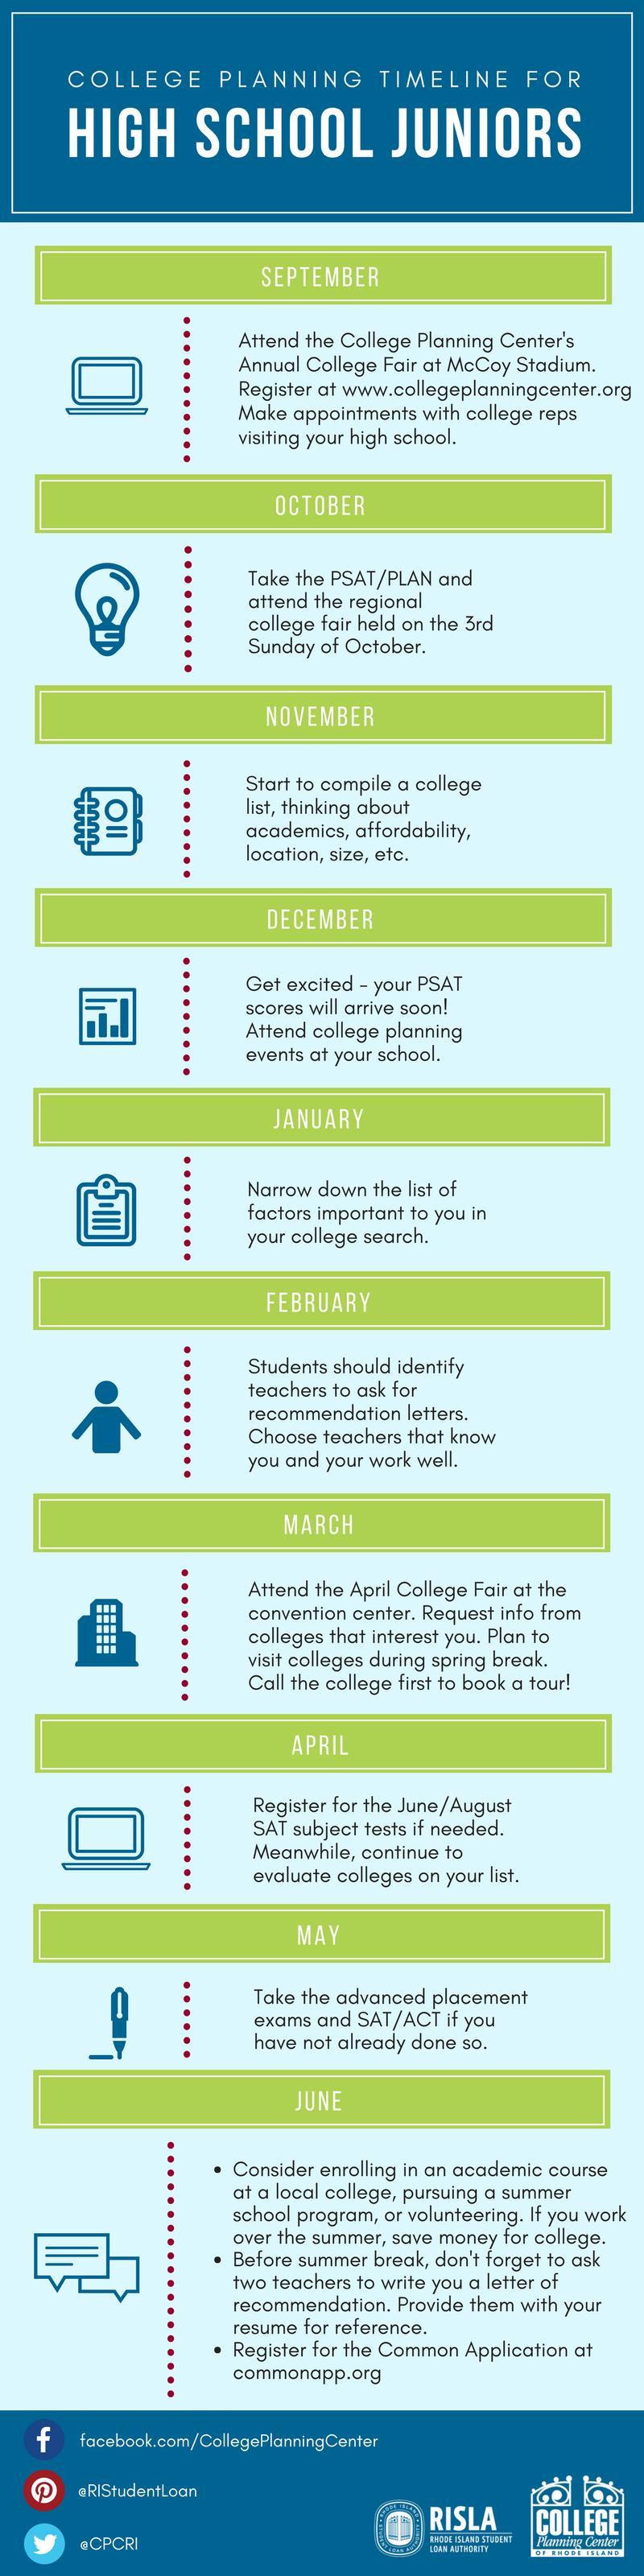 College Planning Timeline HS Juniors